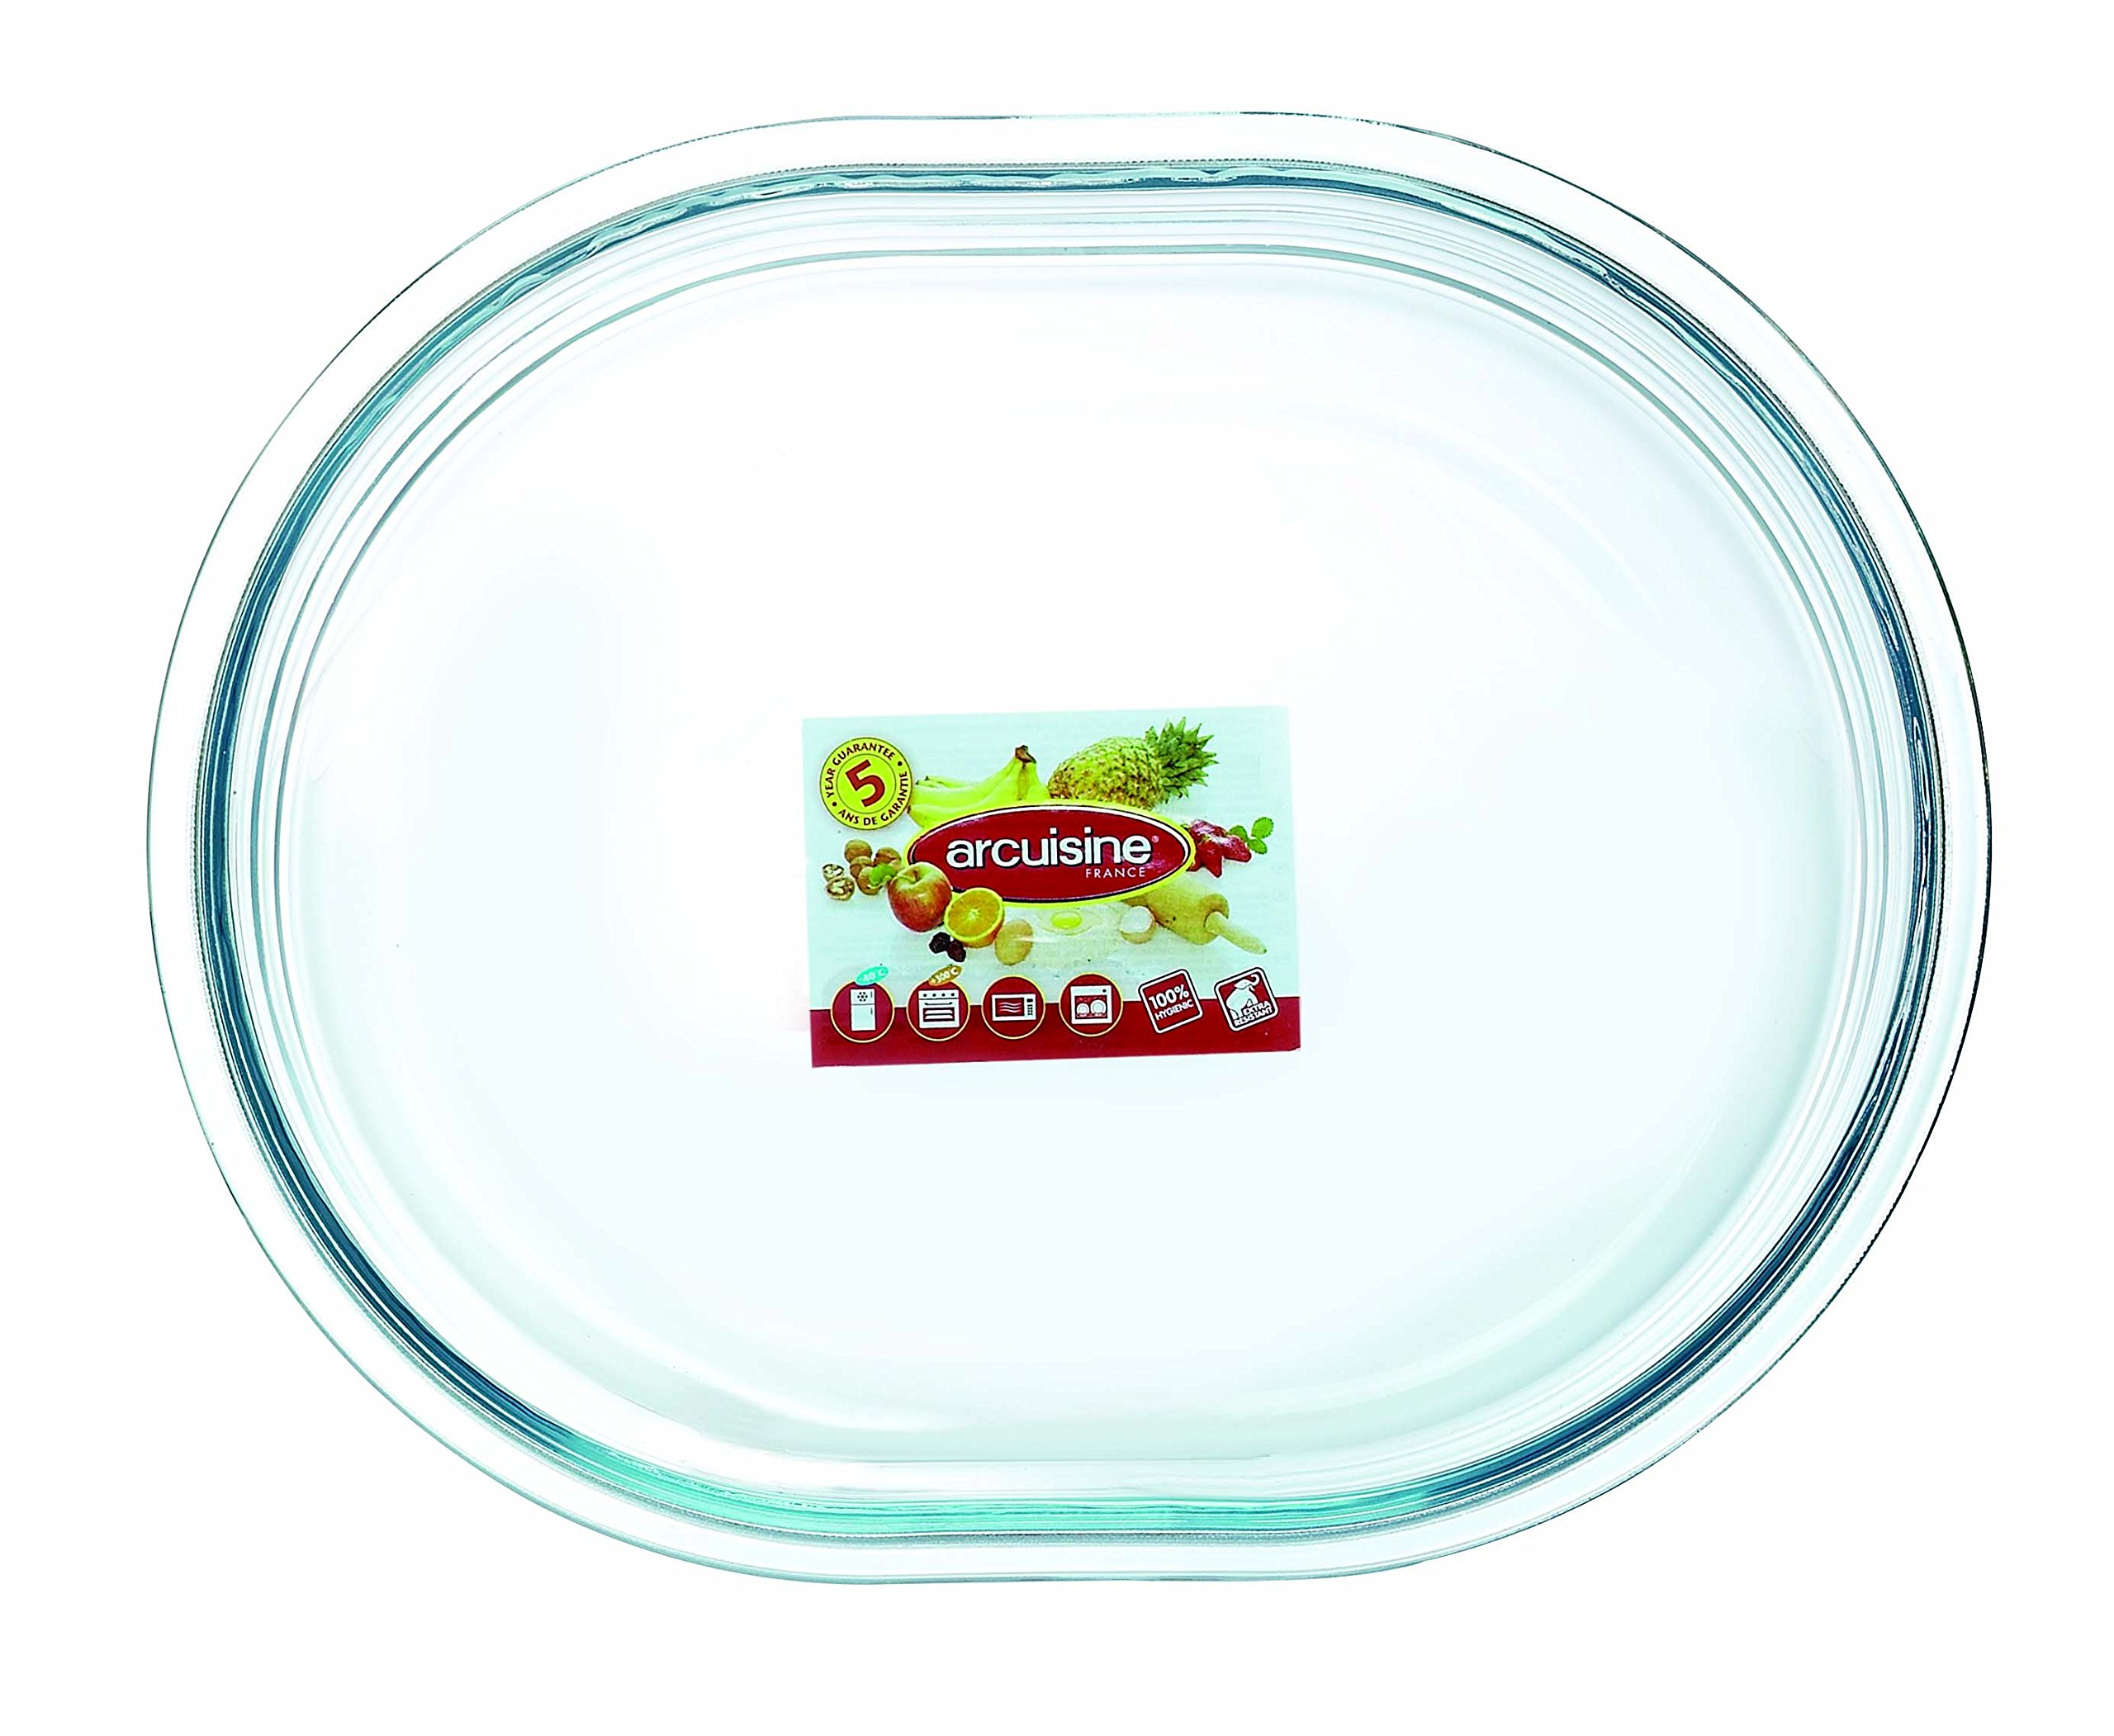 Arcuisine Borosilicate Glass Oval Roaster 9.85 Inches (25 Centimeter)